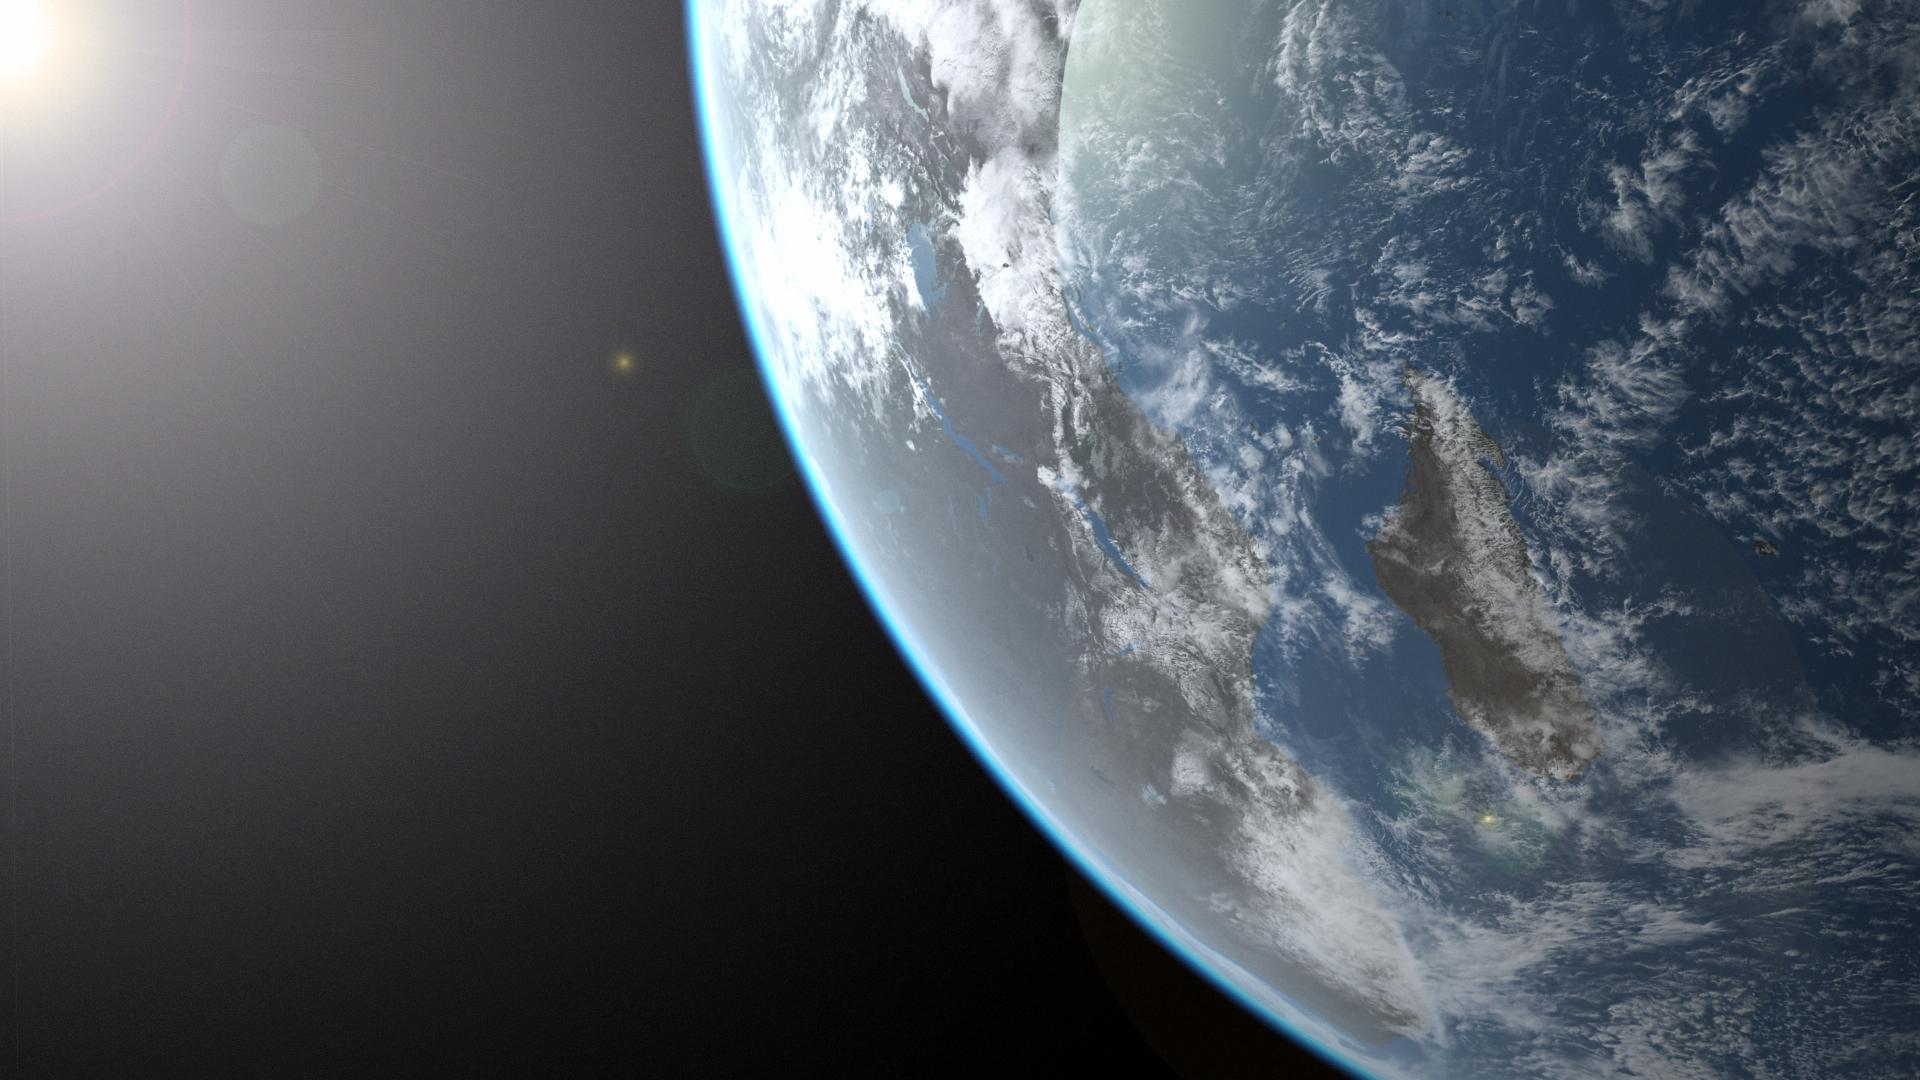 planet mars hd 1080p - photo #33